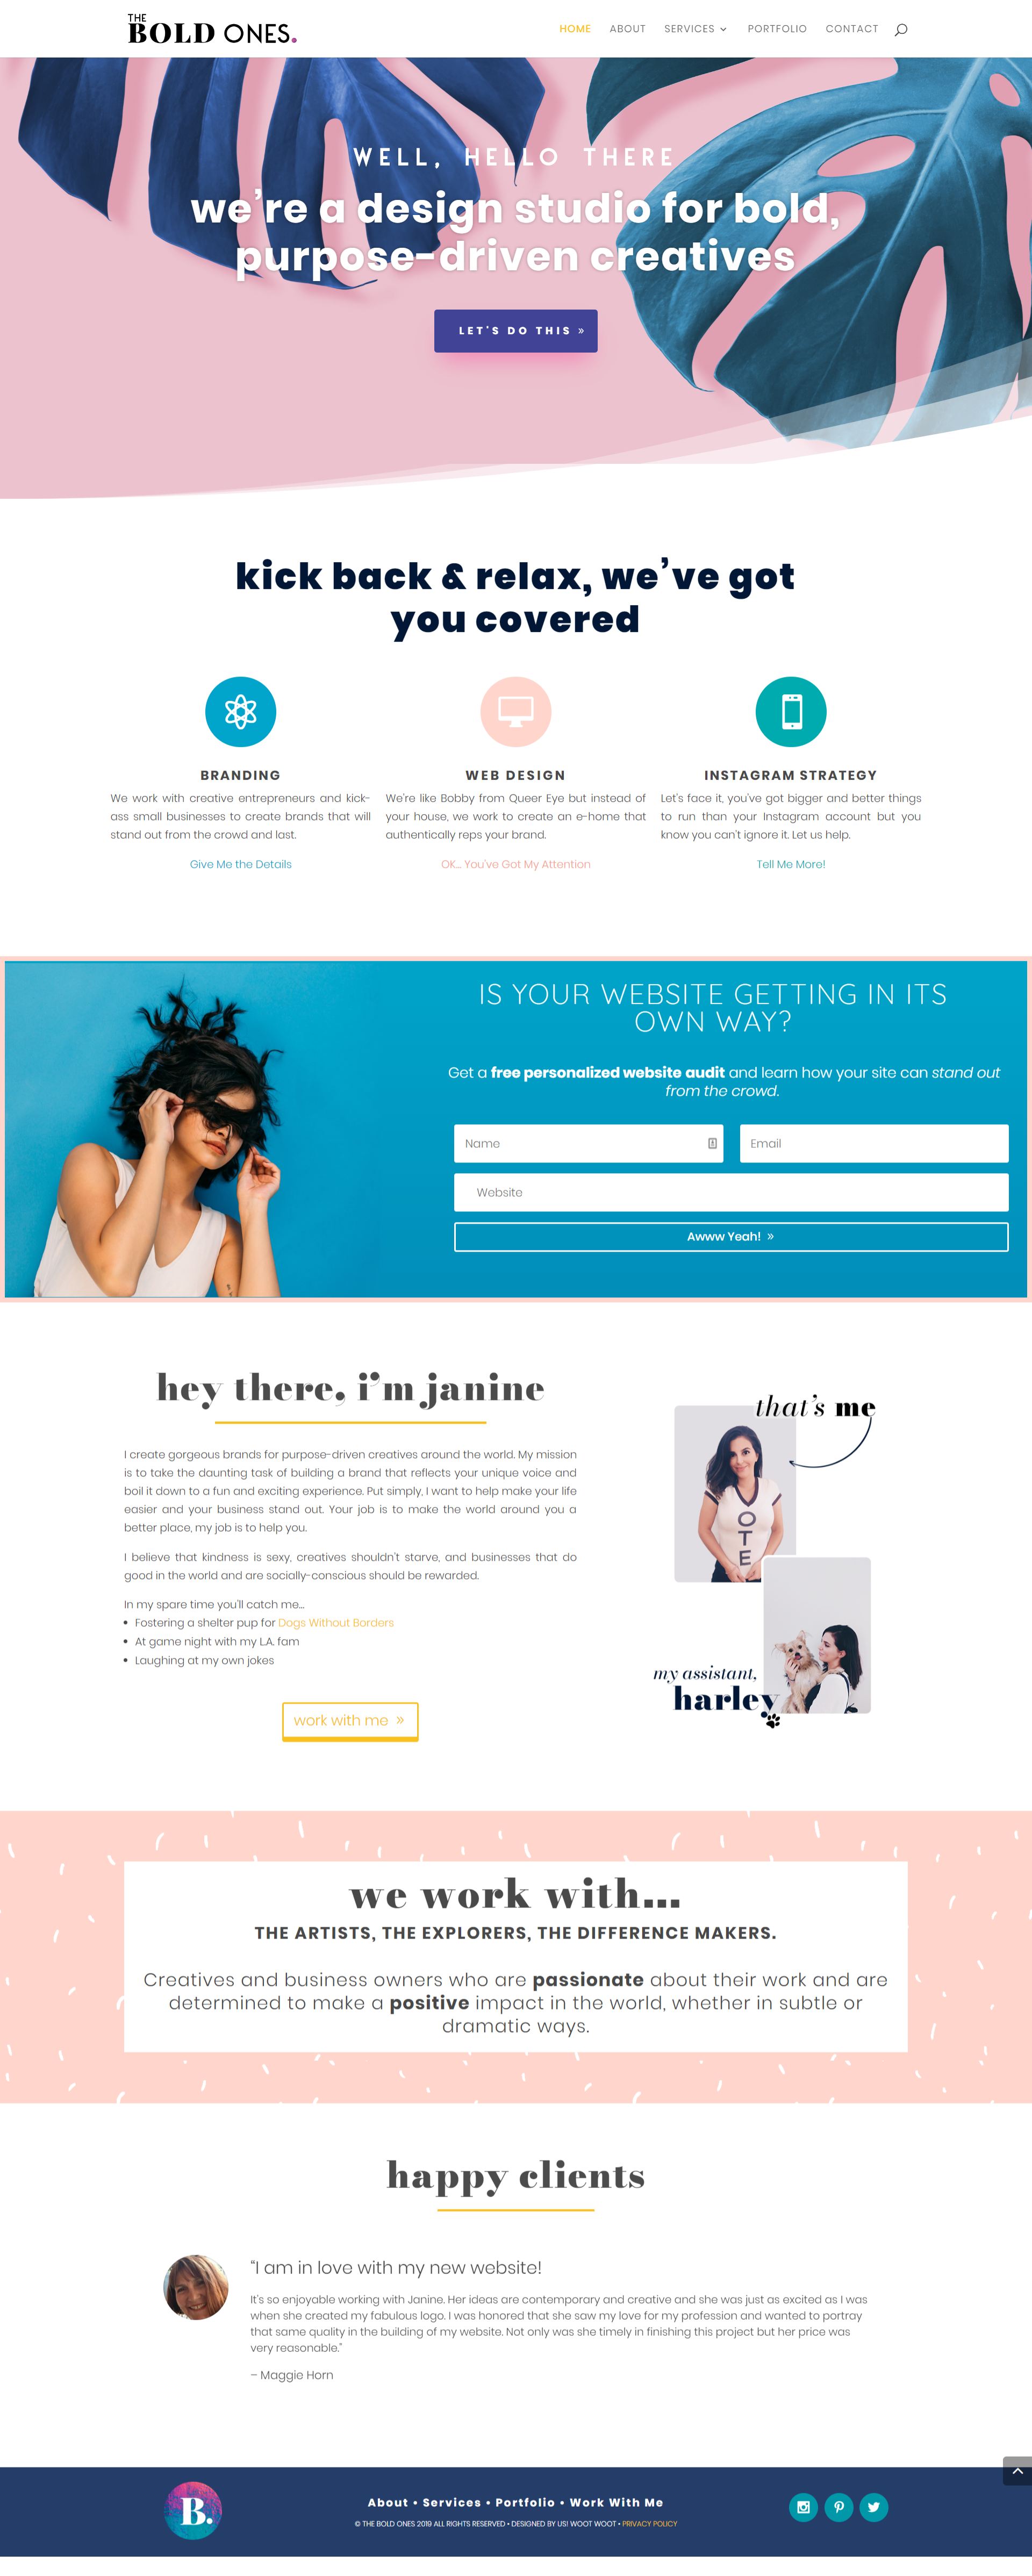 The Bold Ones Branding And Web Design Studio Homepage